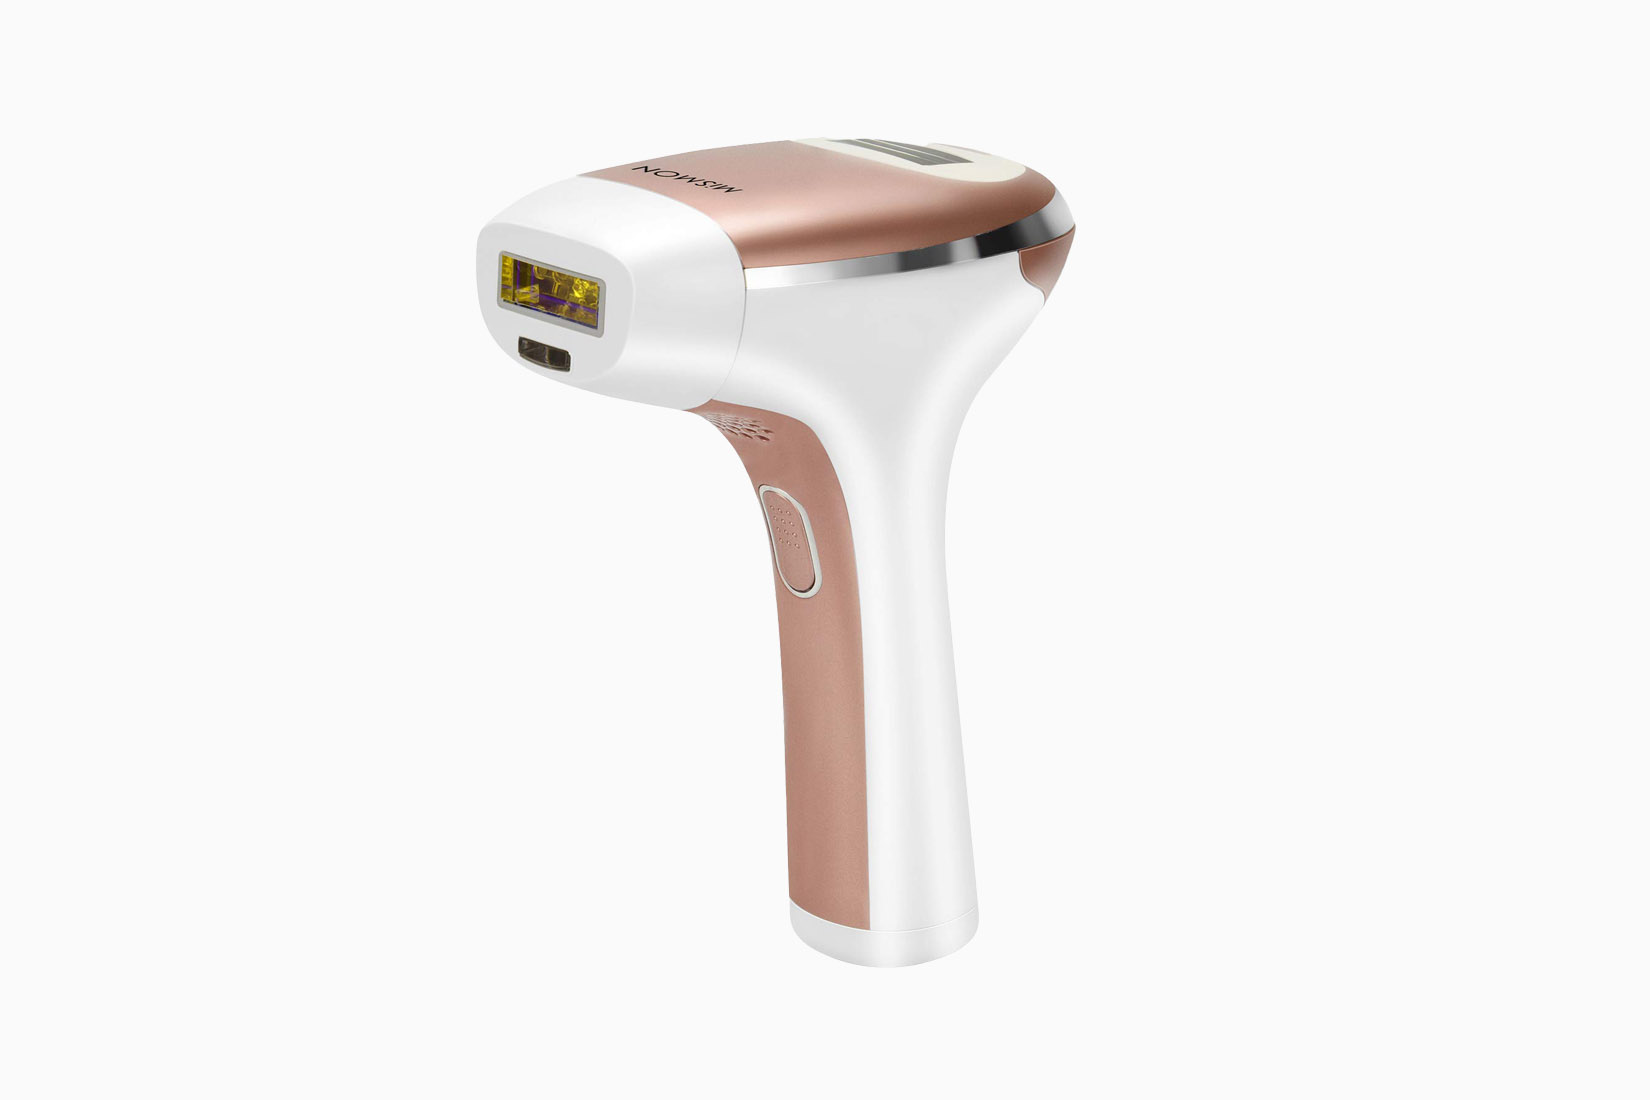 best ipl hair removal mismon review Luxe Digital